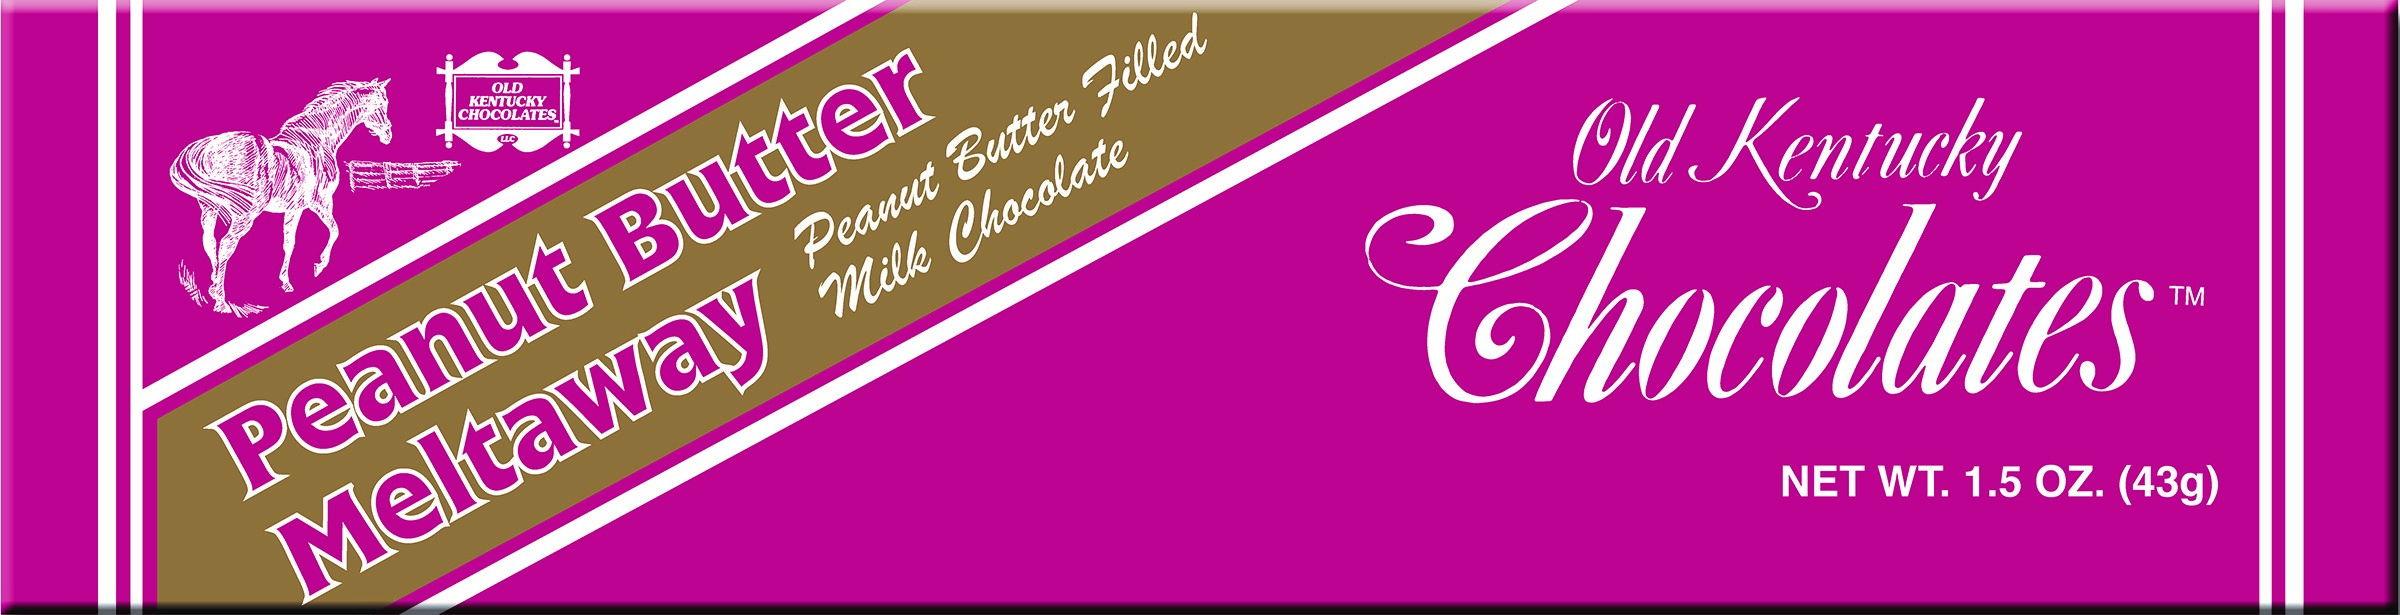 Old Kentucky Chocolates Peanut Butter Meltaway Fundraising